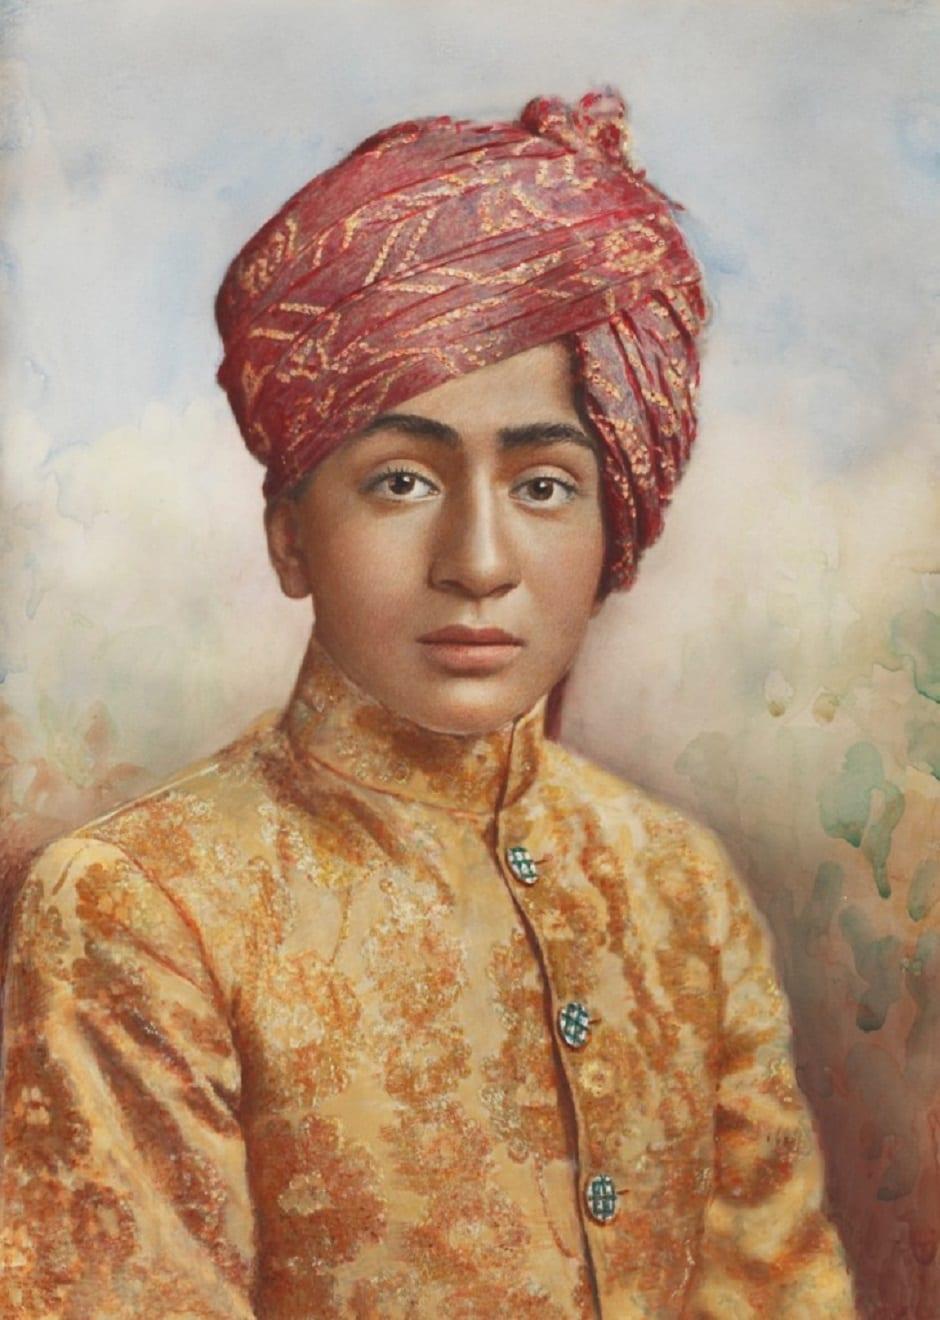 Prince of Morvi, Lafayette Studios. Courtesy Sarmaya Collection, Mumbai